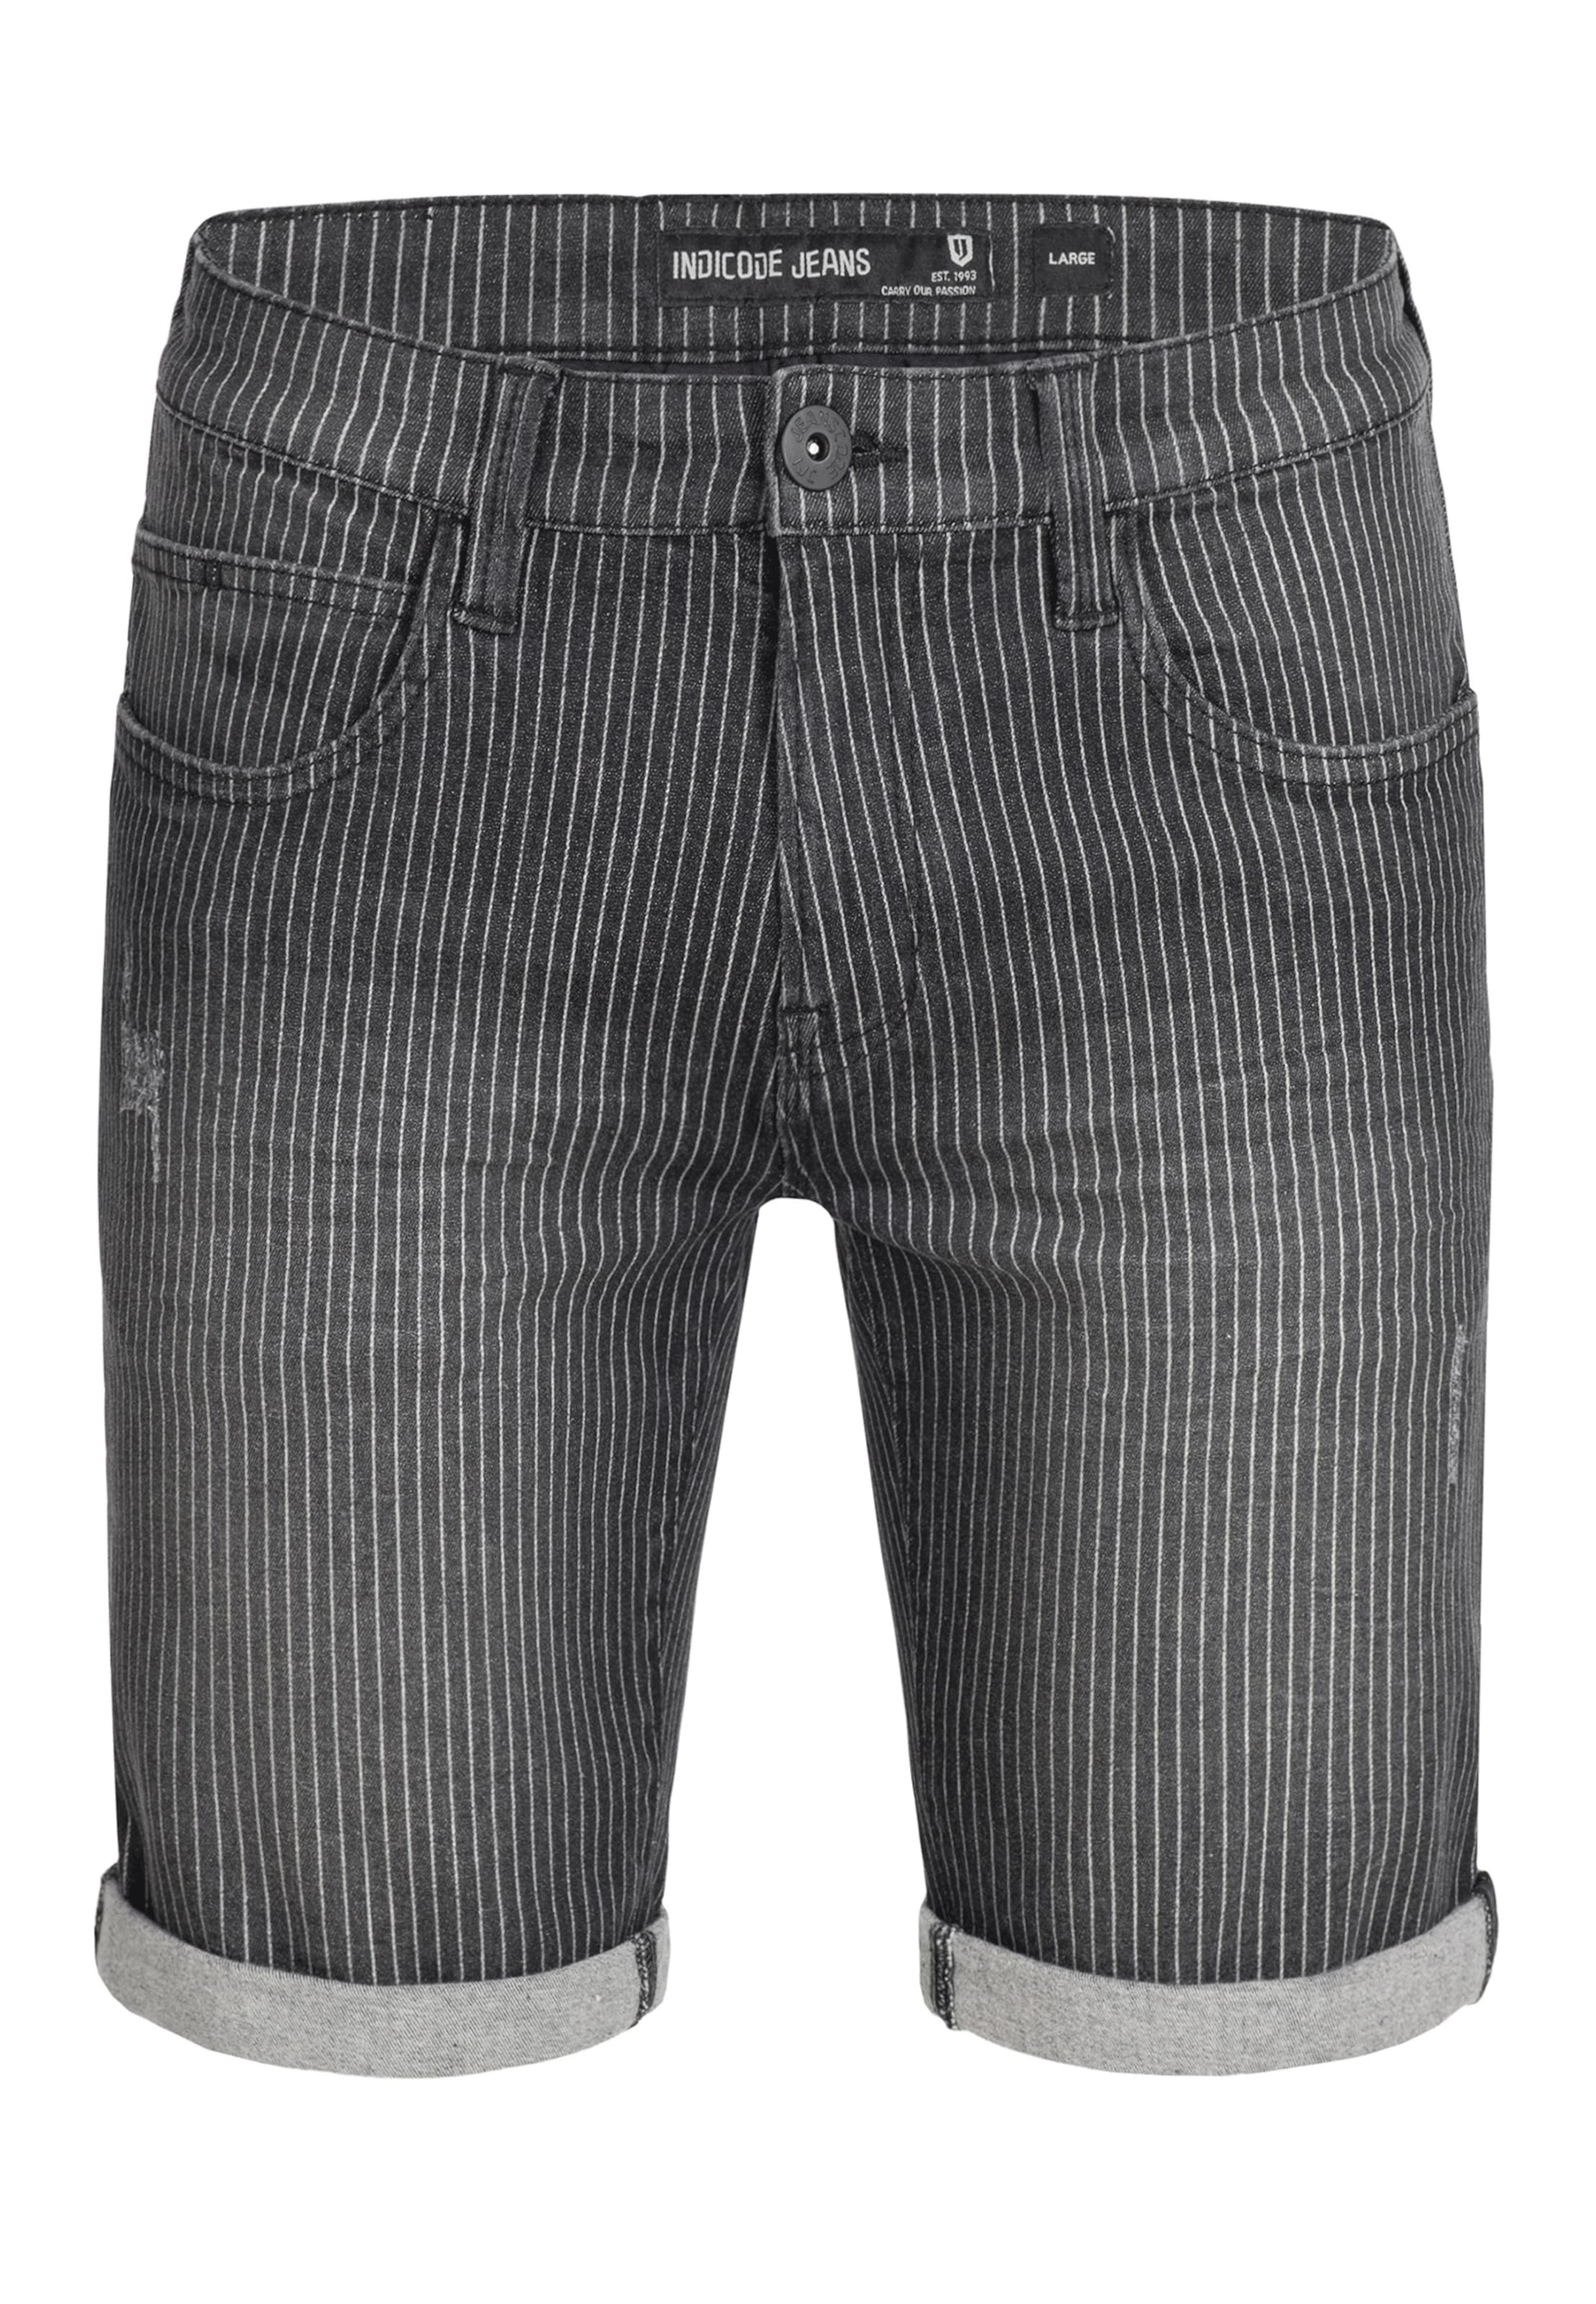 Shorts 'caden' Indicode Dunkelgrau Jeans In 354RcAjLq